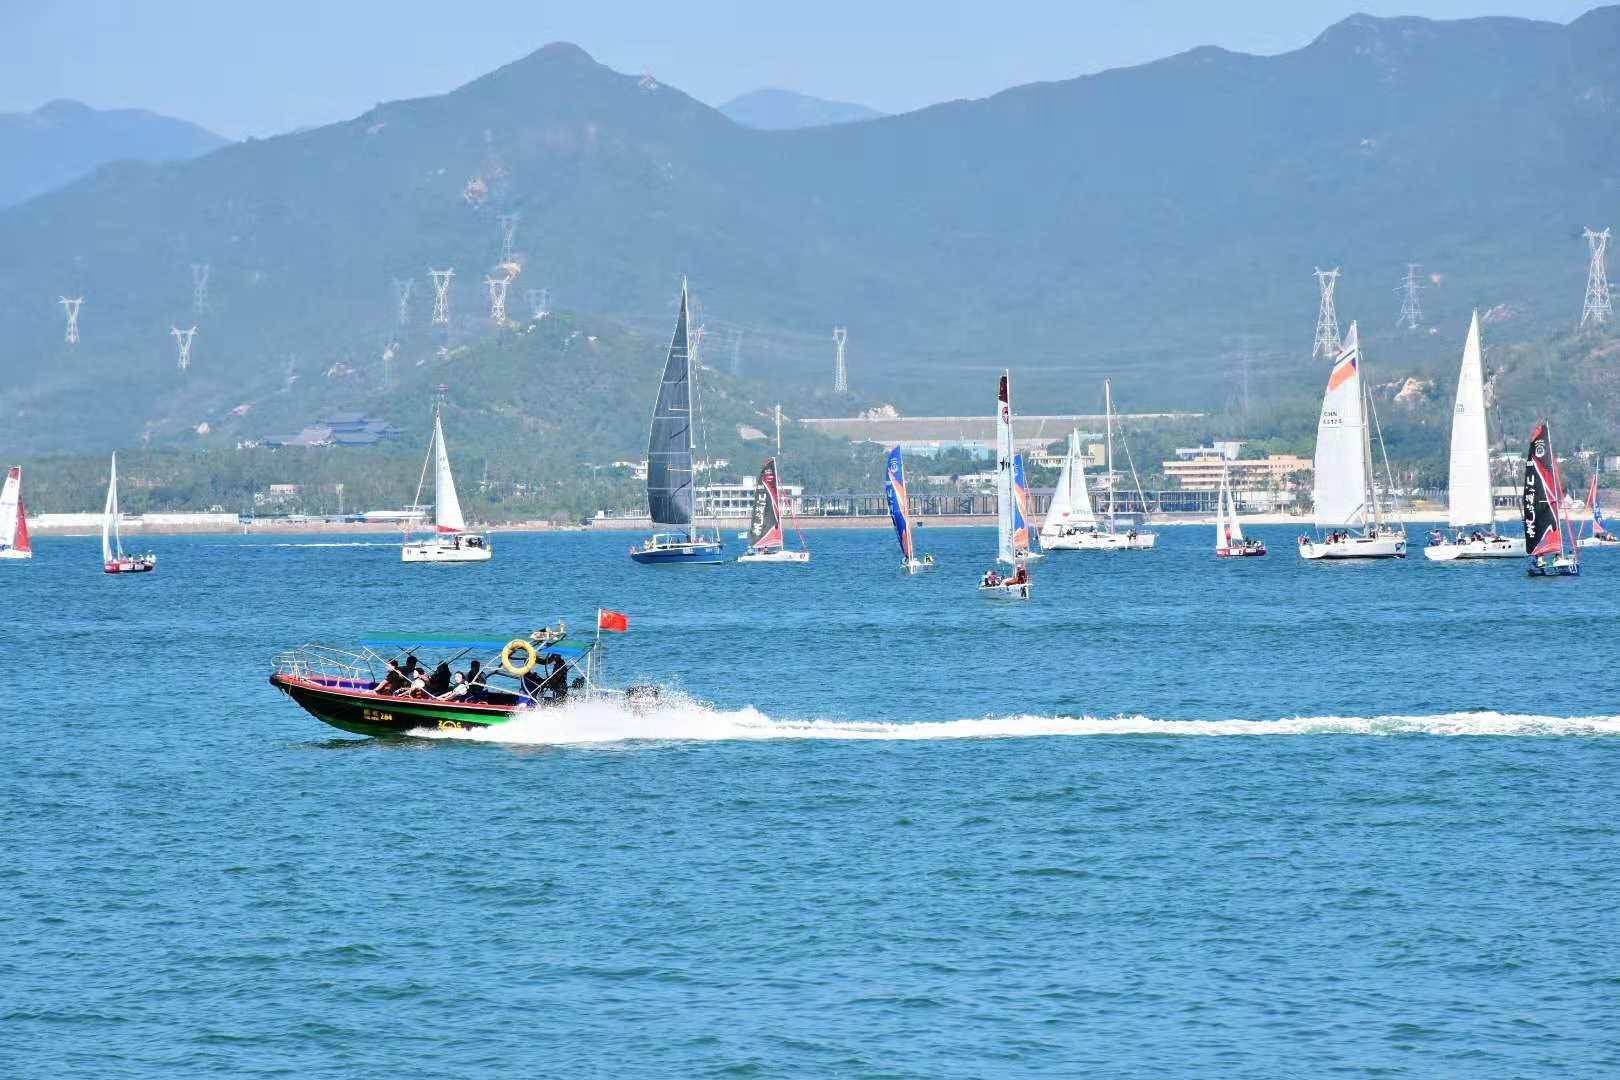 , Fall 2018 Dapeng Yacht Club Water Sports Outing, SDE Seadragon Education